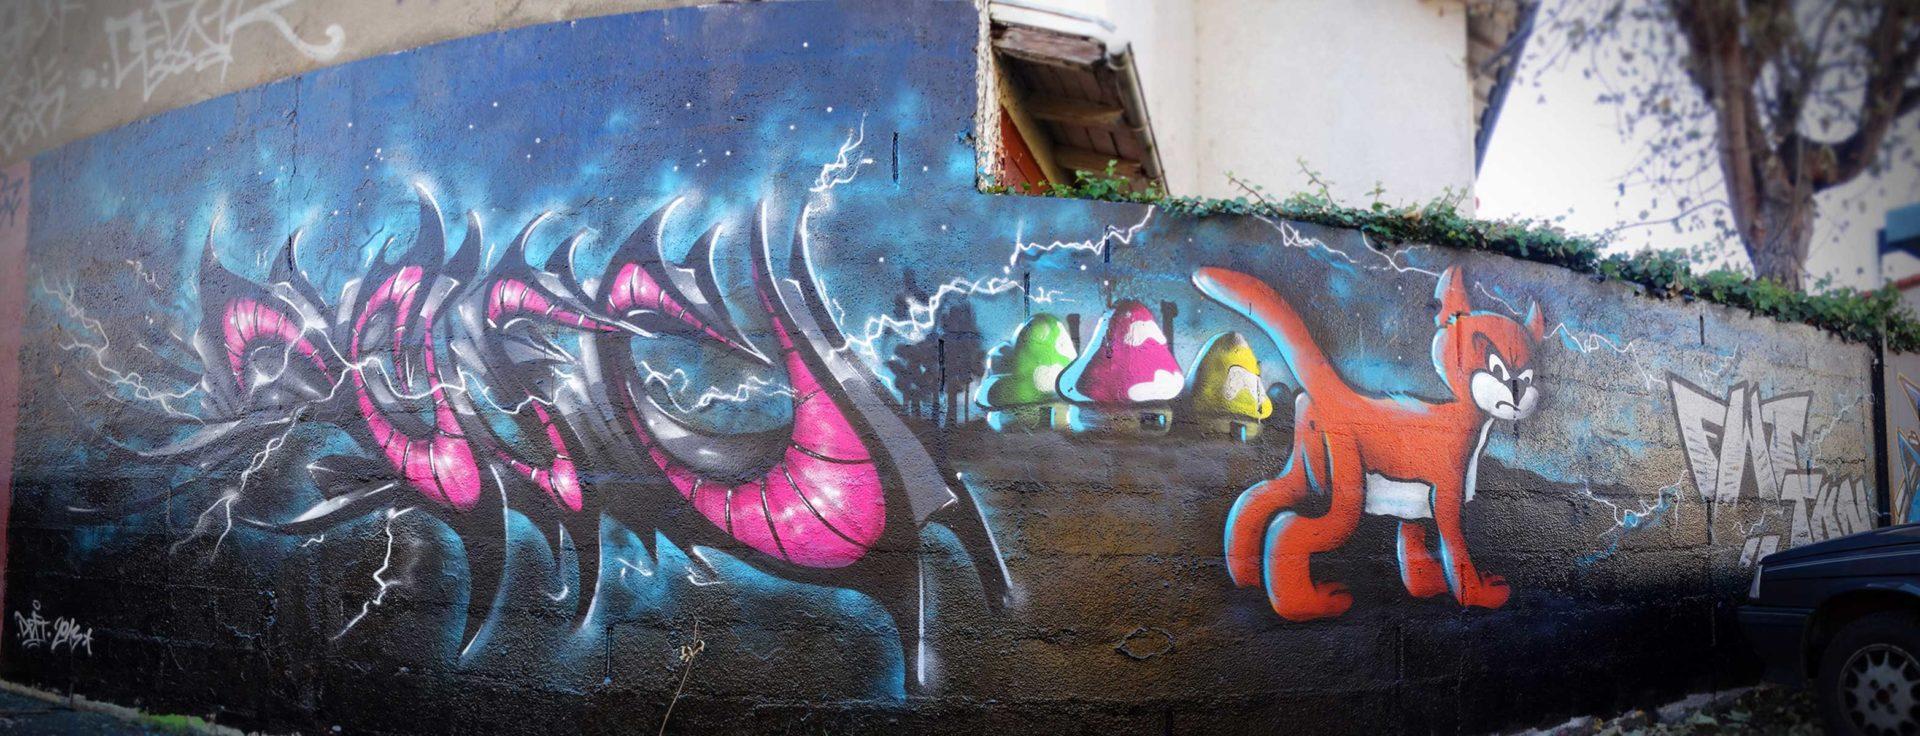 graffiti_Schroumph_deft_2013